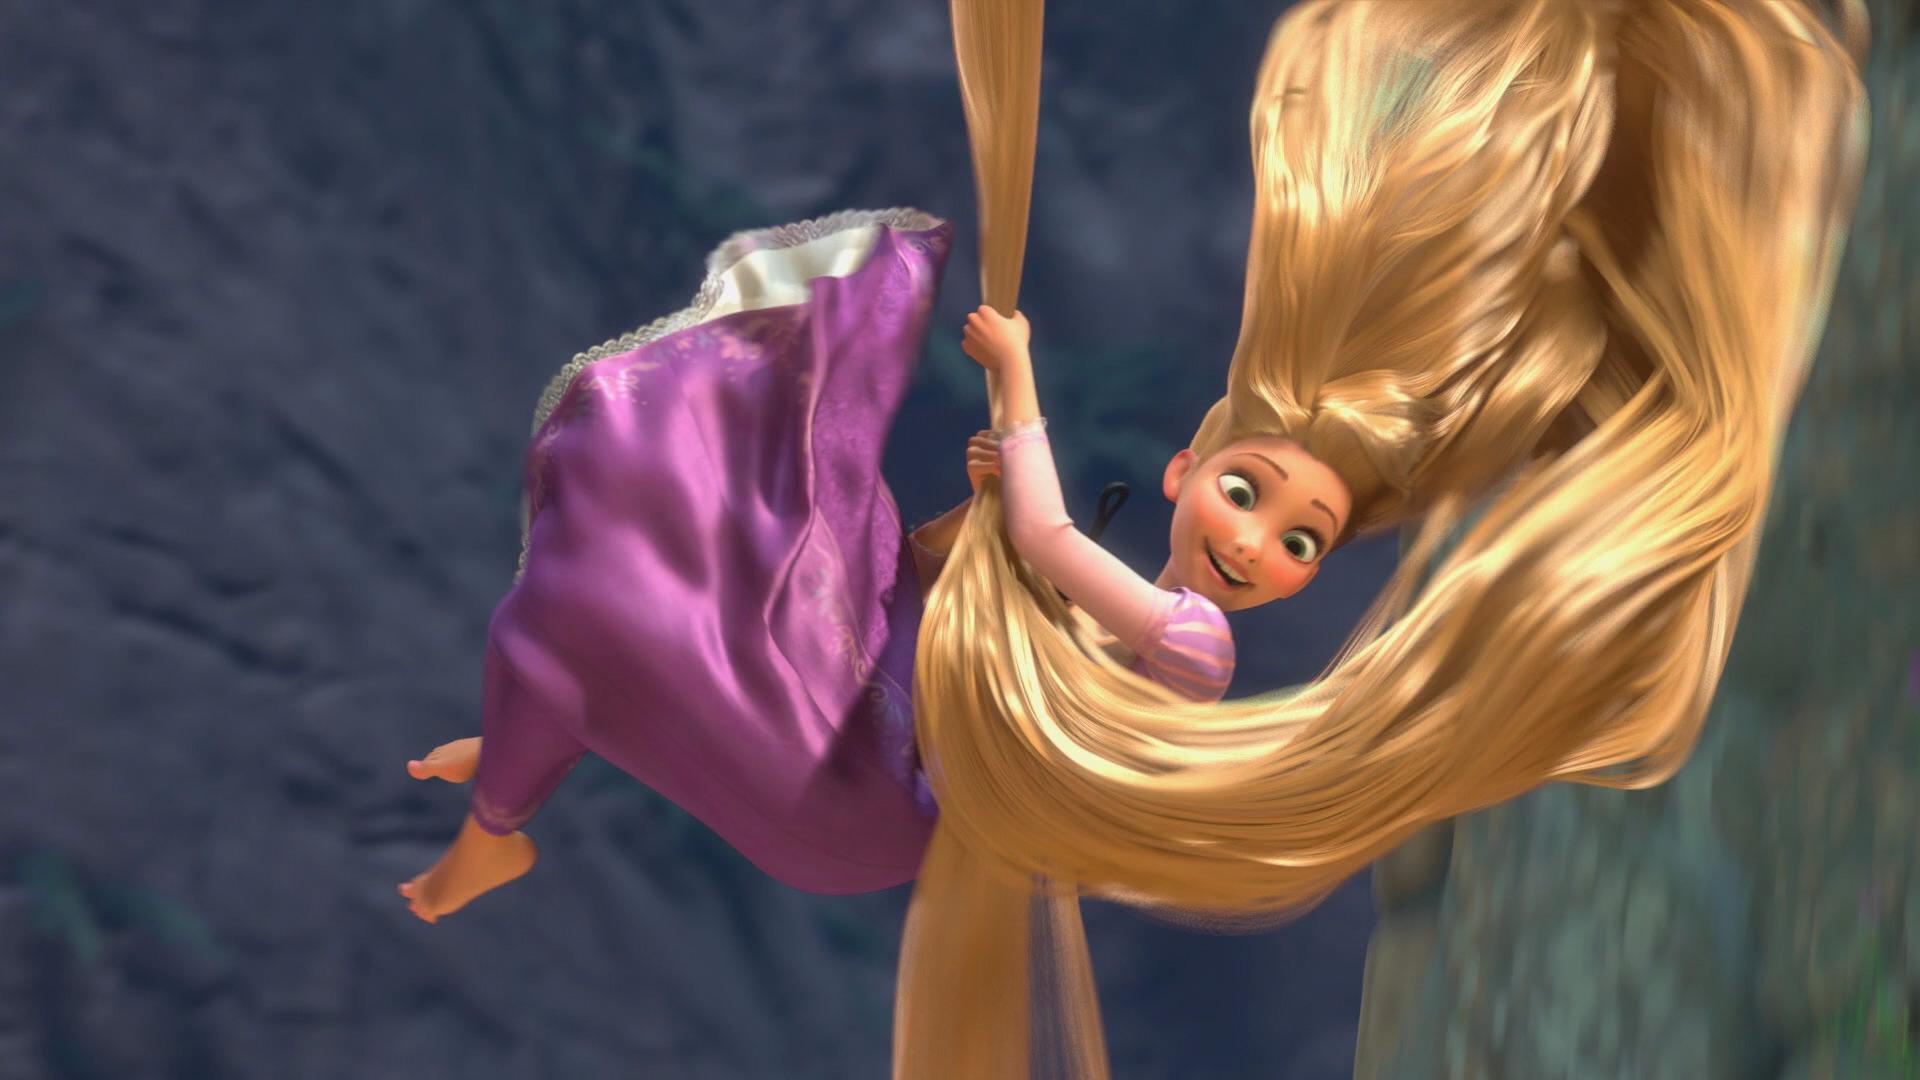 File:Rapunzel Sliding Down Tower On Hair.jpeg